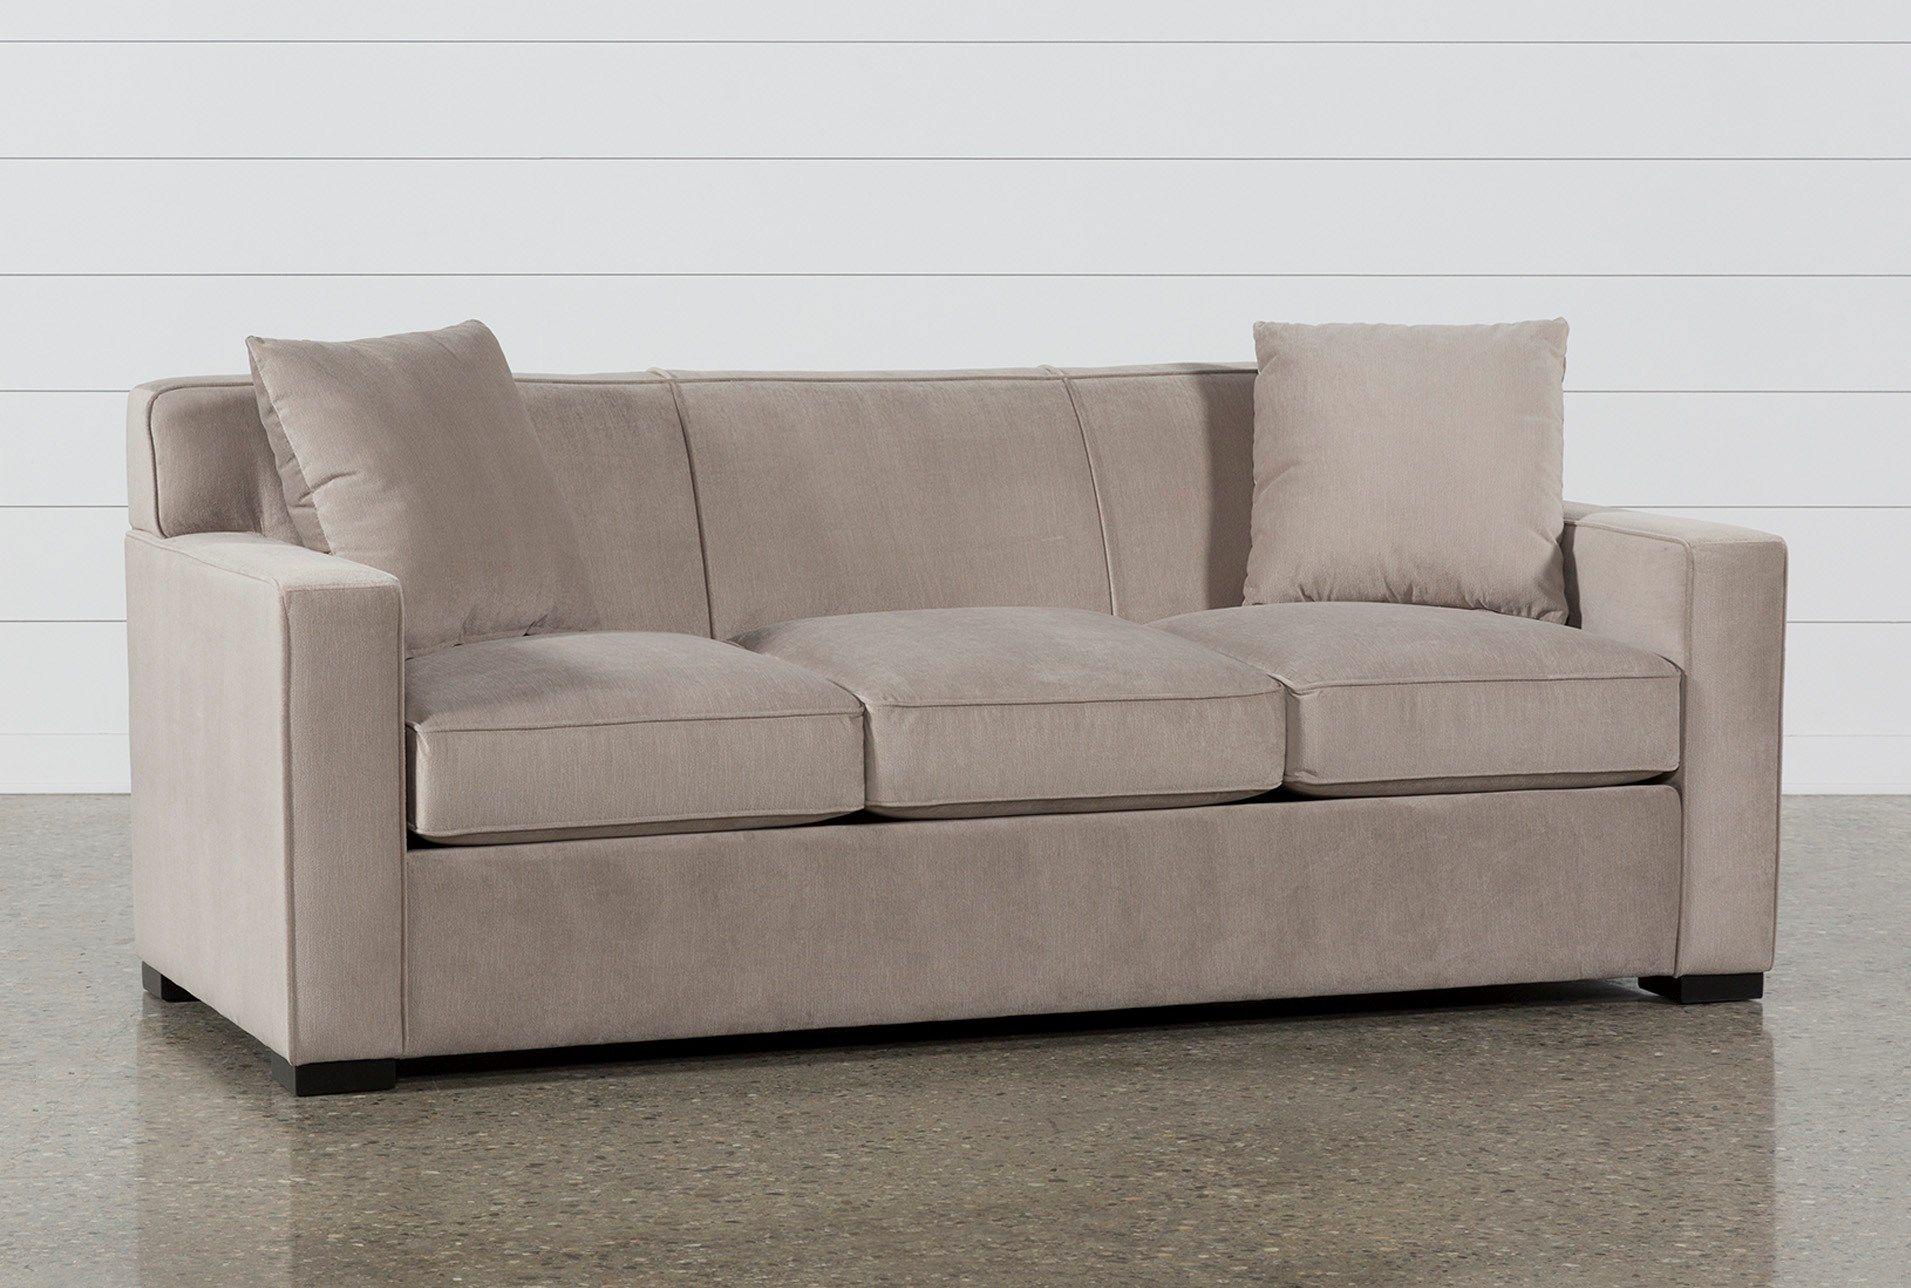 Kasen Sofa Sofa Furniture Home Decor